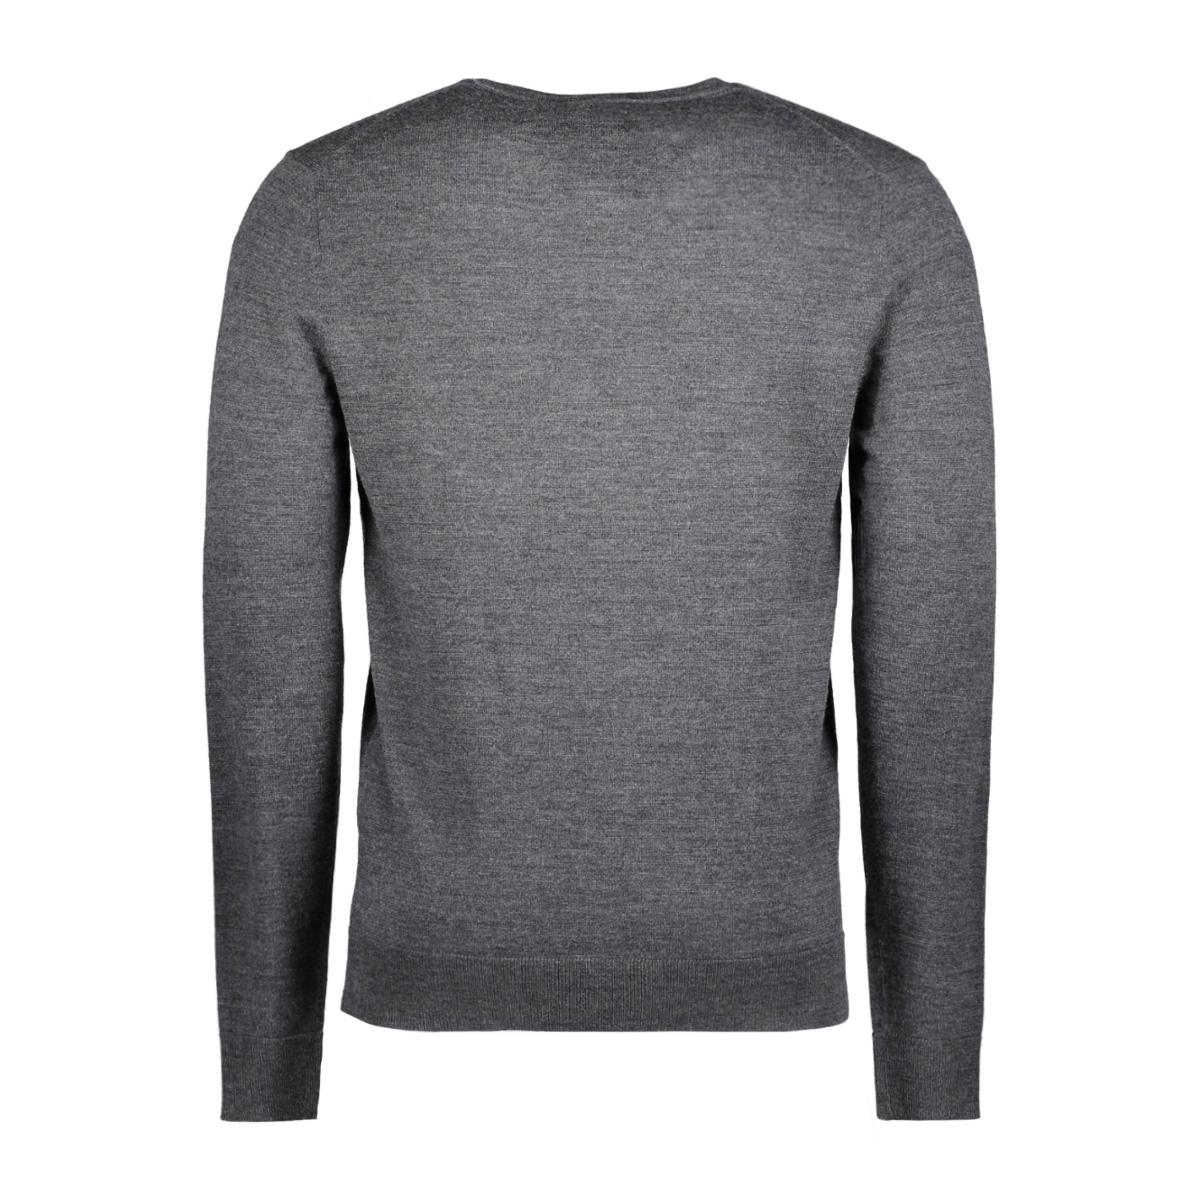 jprmark knit crew neck noos 12109976 jack & jones trui dark grey melange